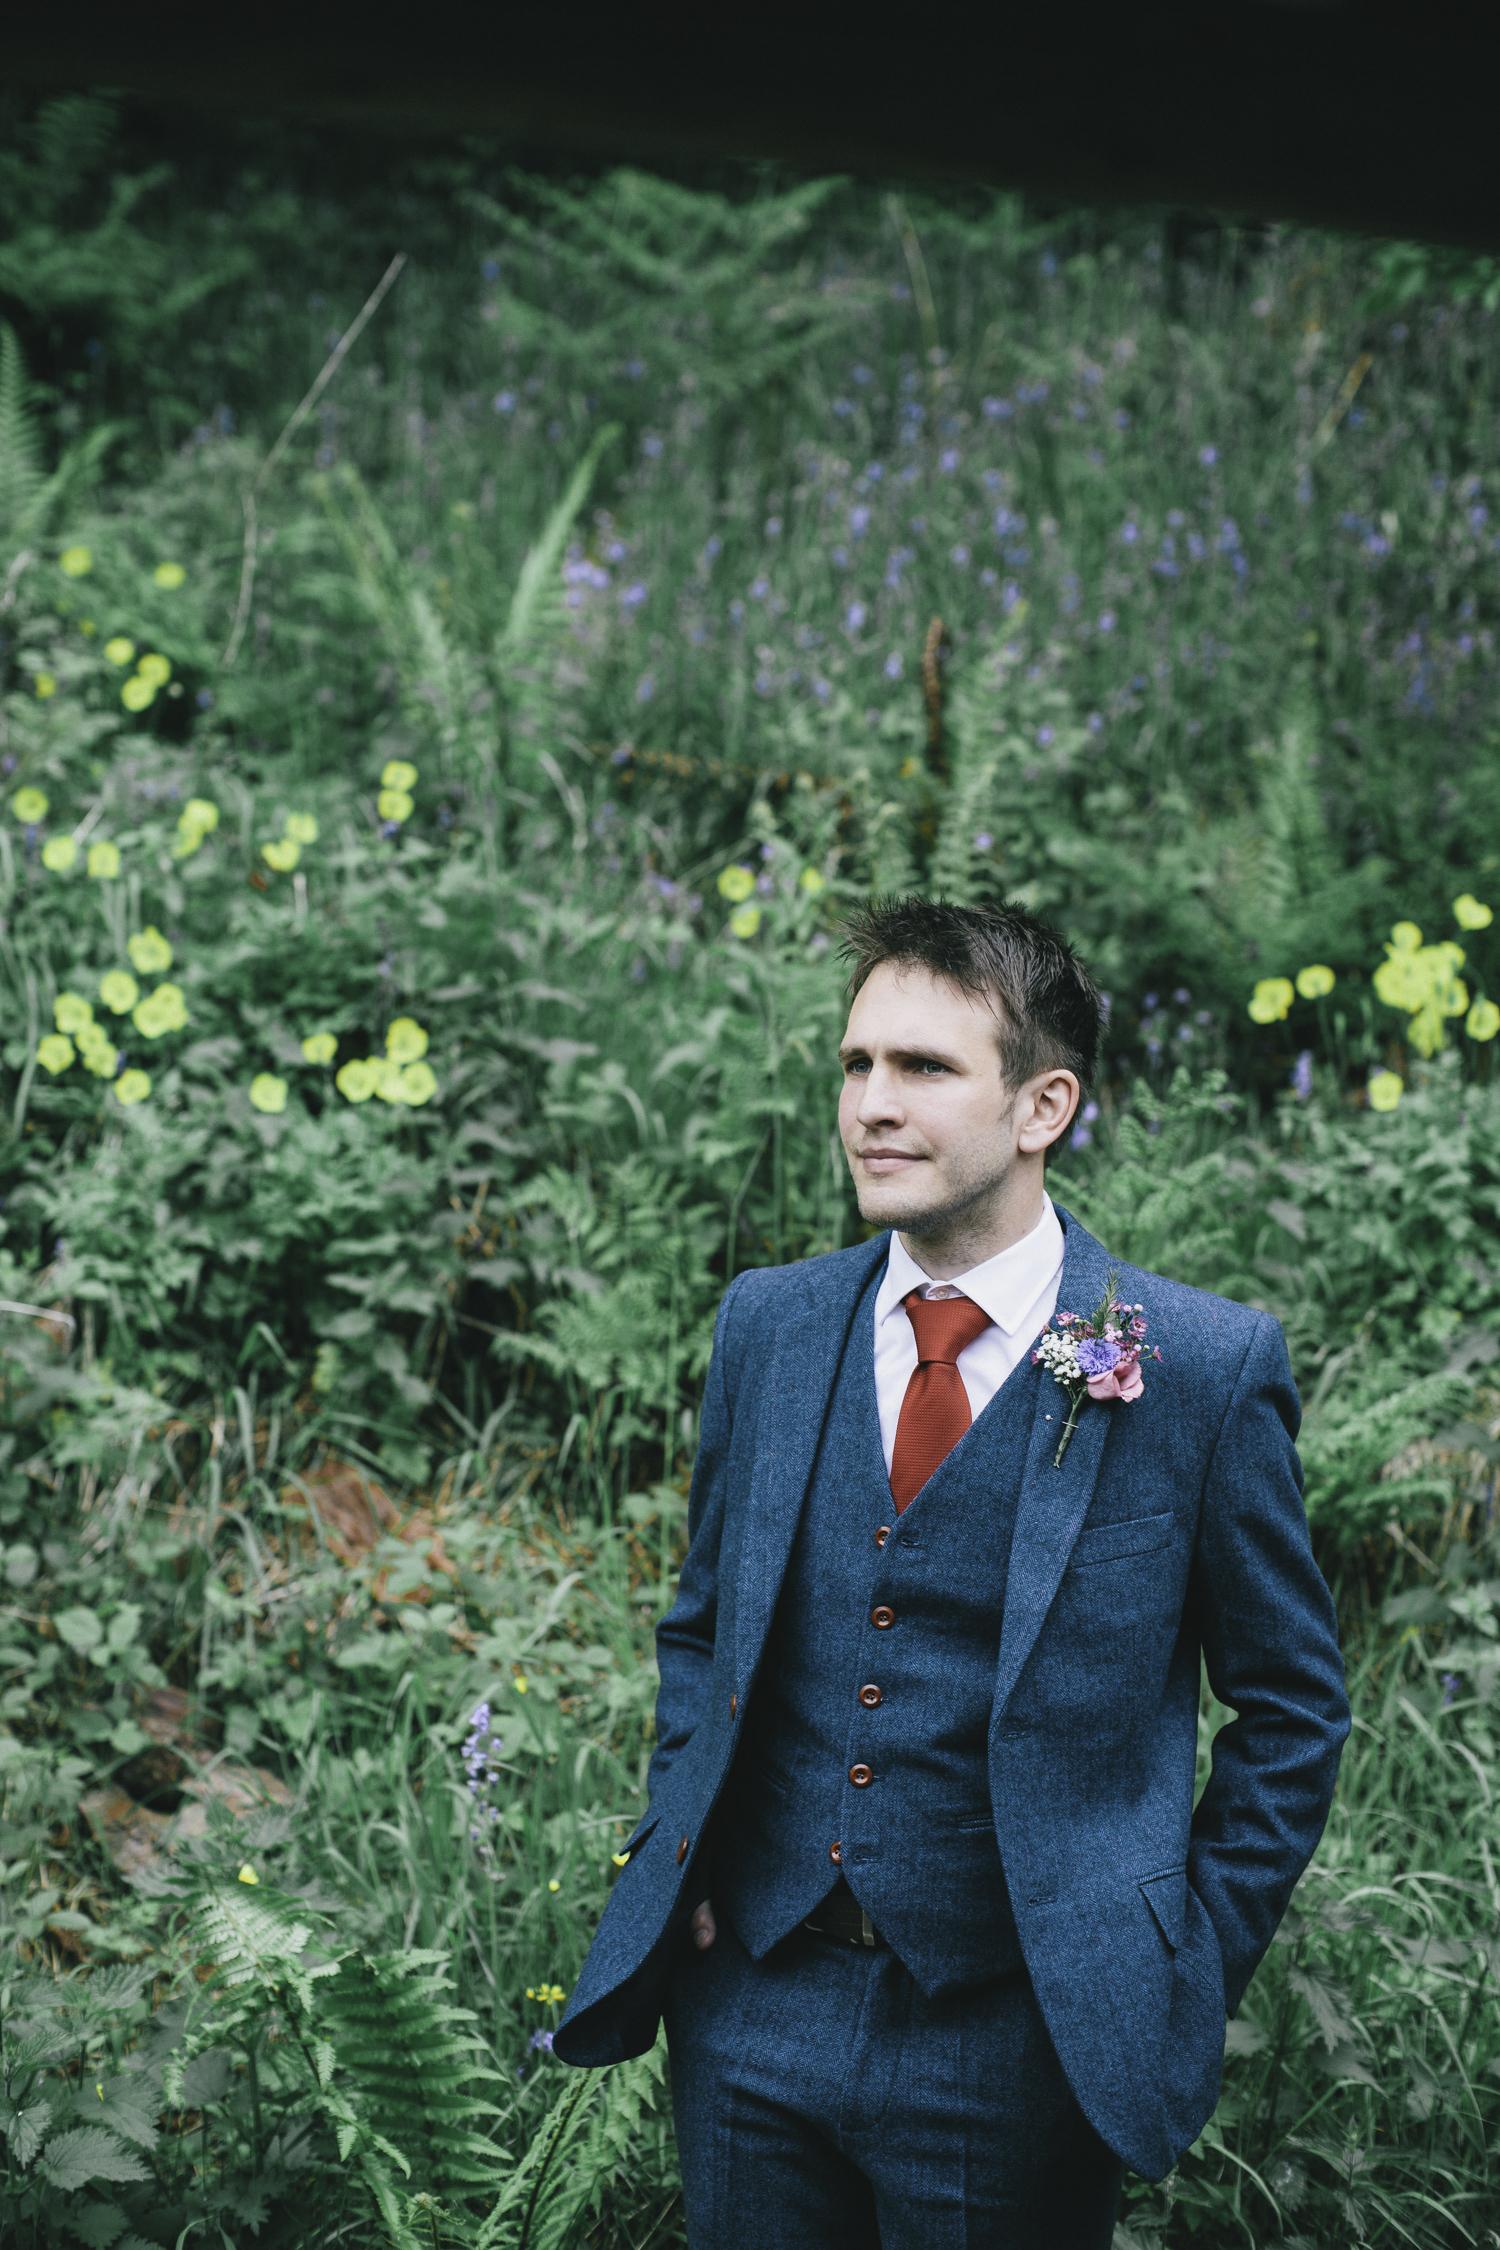 Alternative_wedding_photographer_scotland_borders_mabie_forest-15.jpg